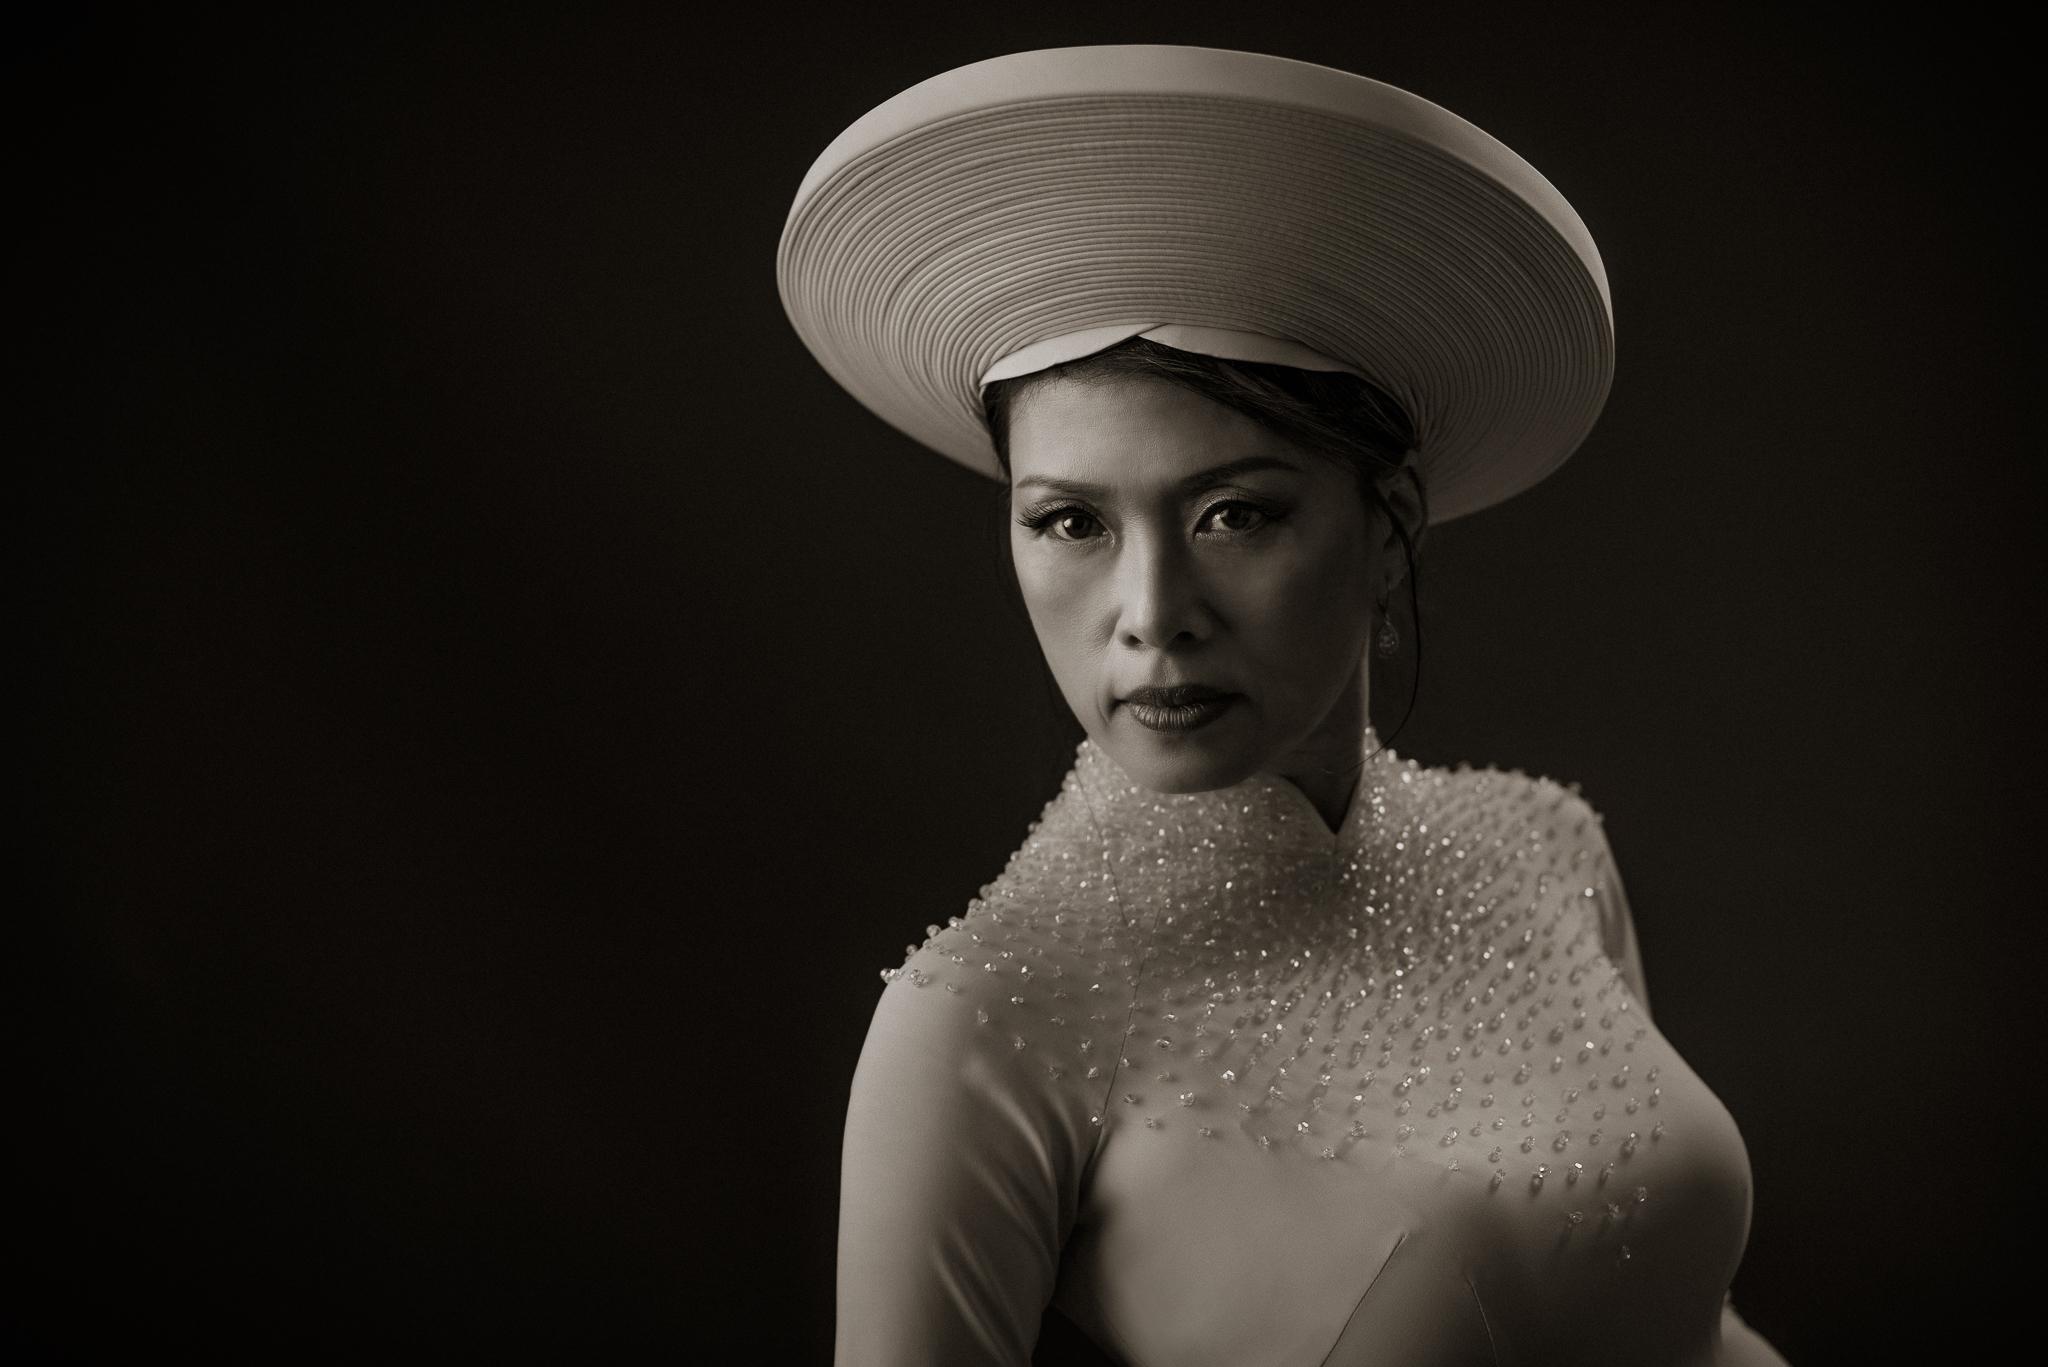 San Diego Photographer - Portrait